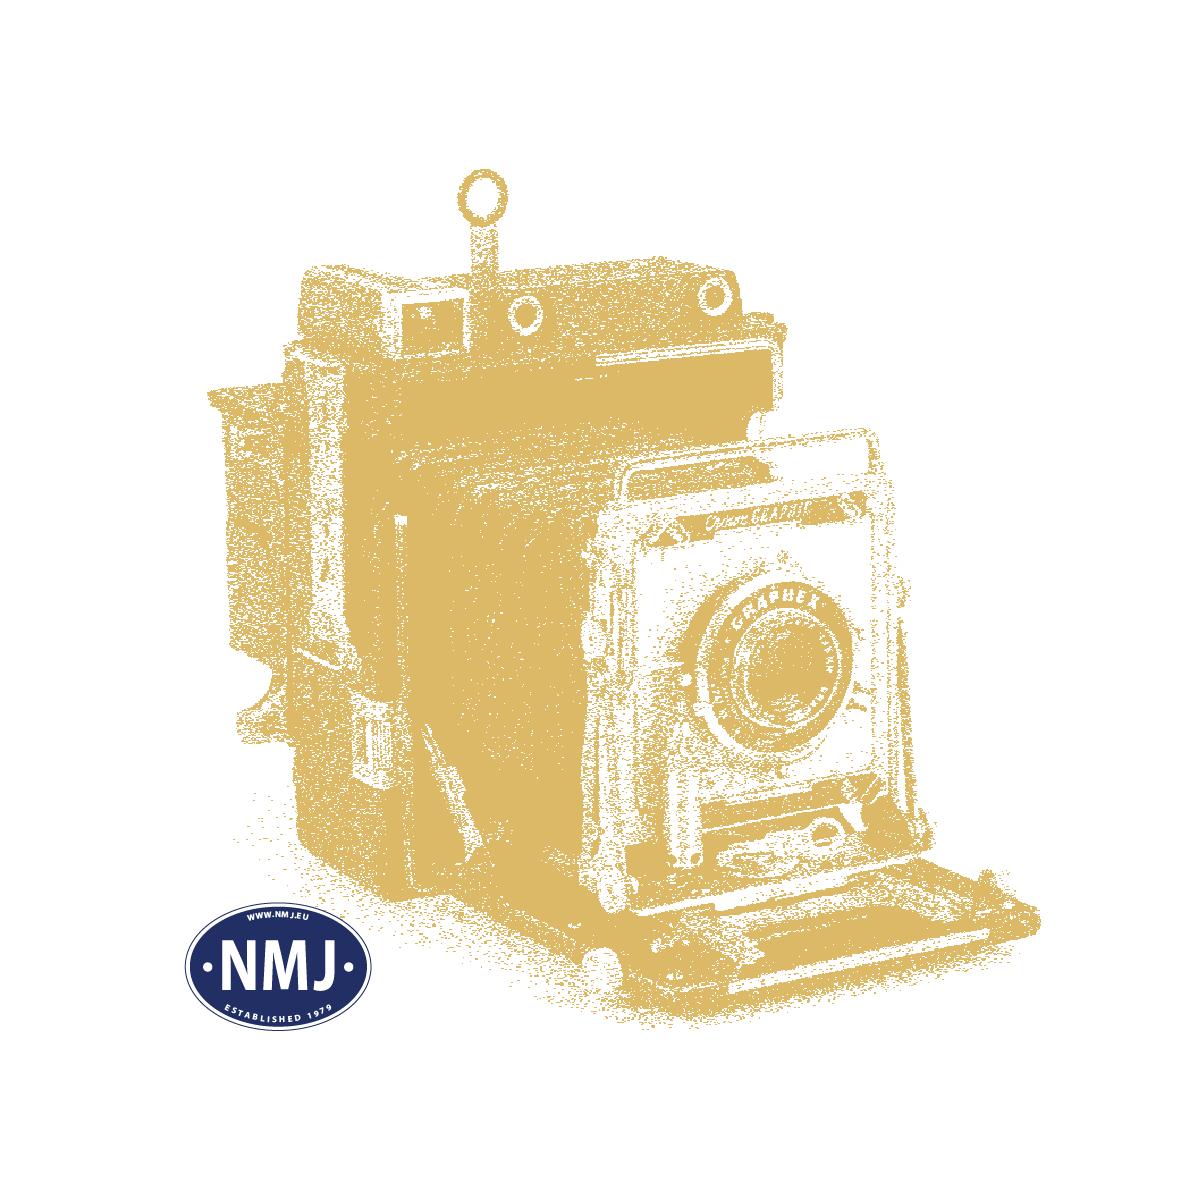 MWB-M005 - Gressmatte, Rough Medow, Sensommer, 30 x 21 Cm